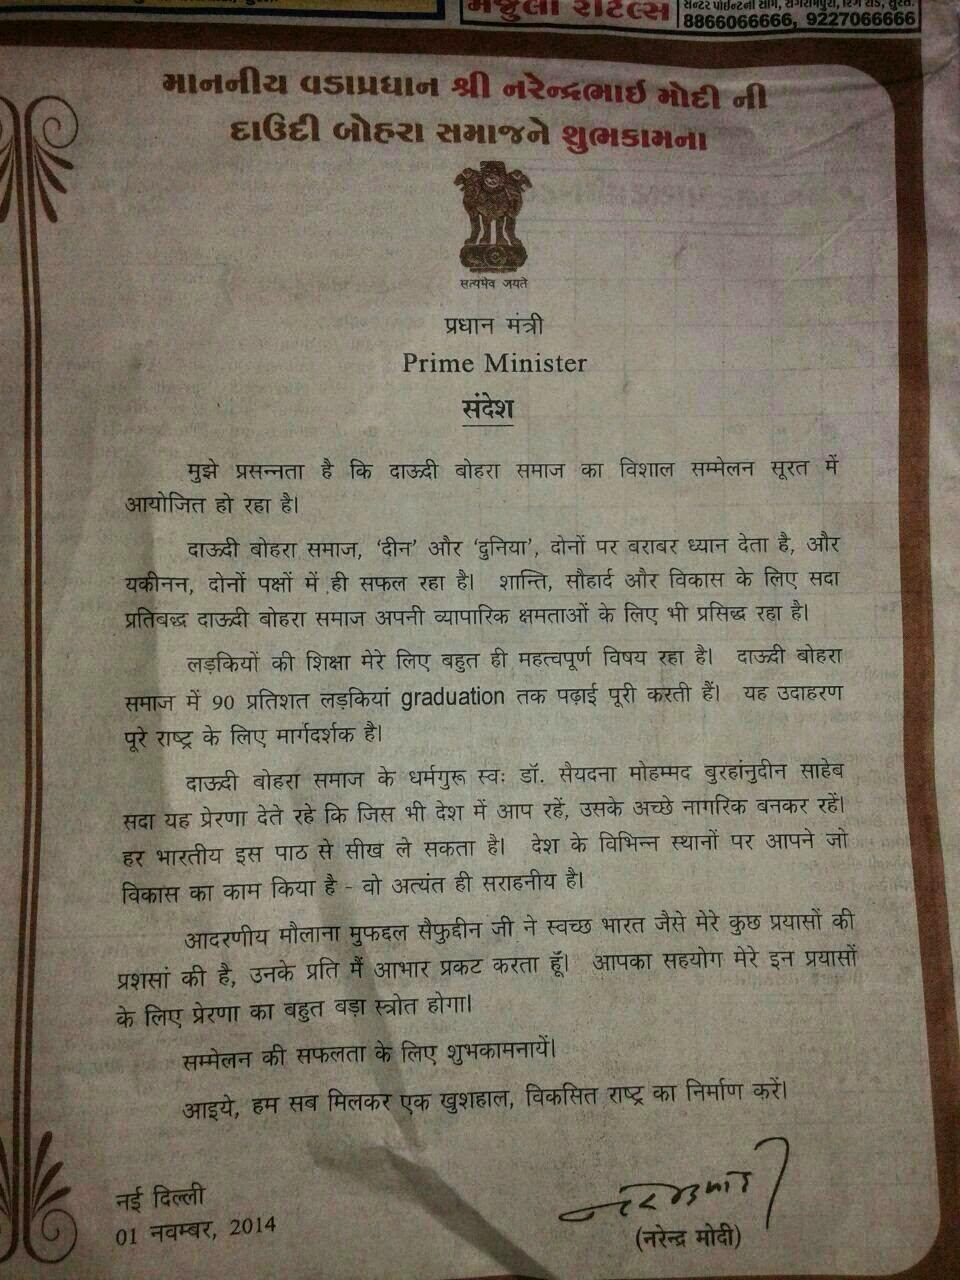 prime minister,letter,dawoodi bohra